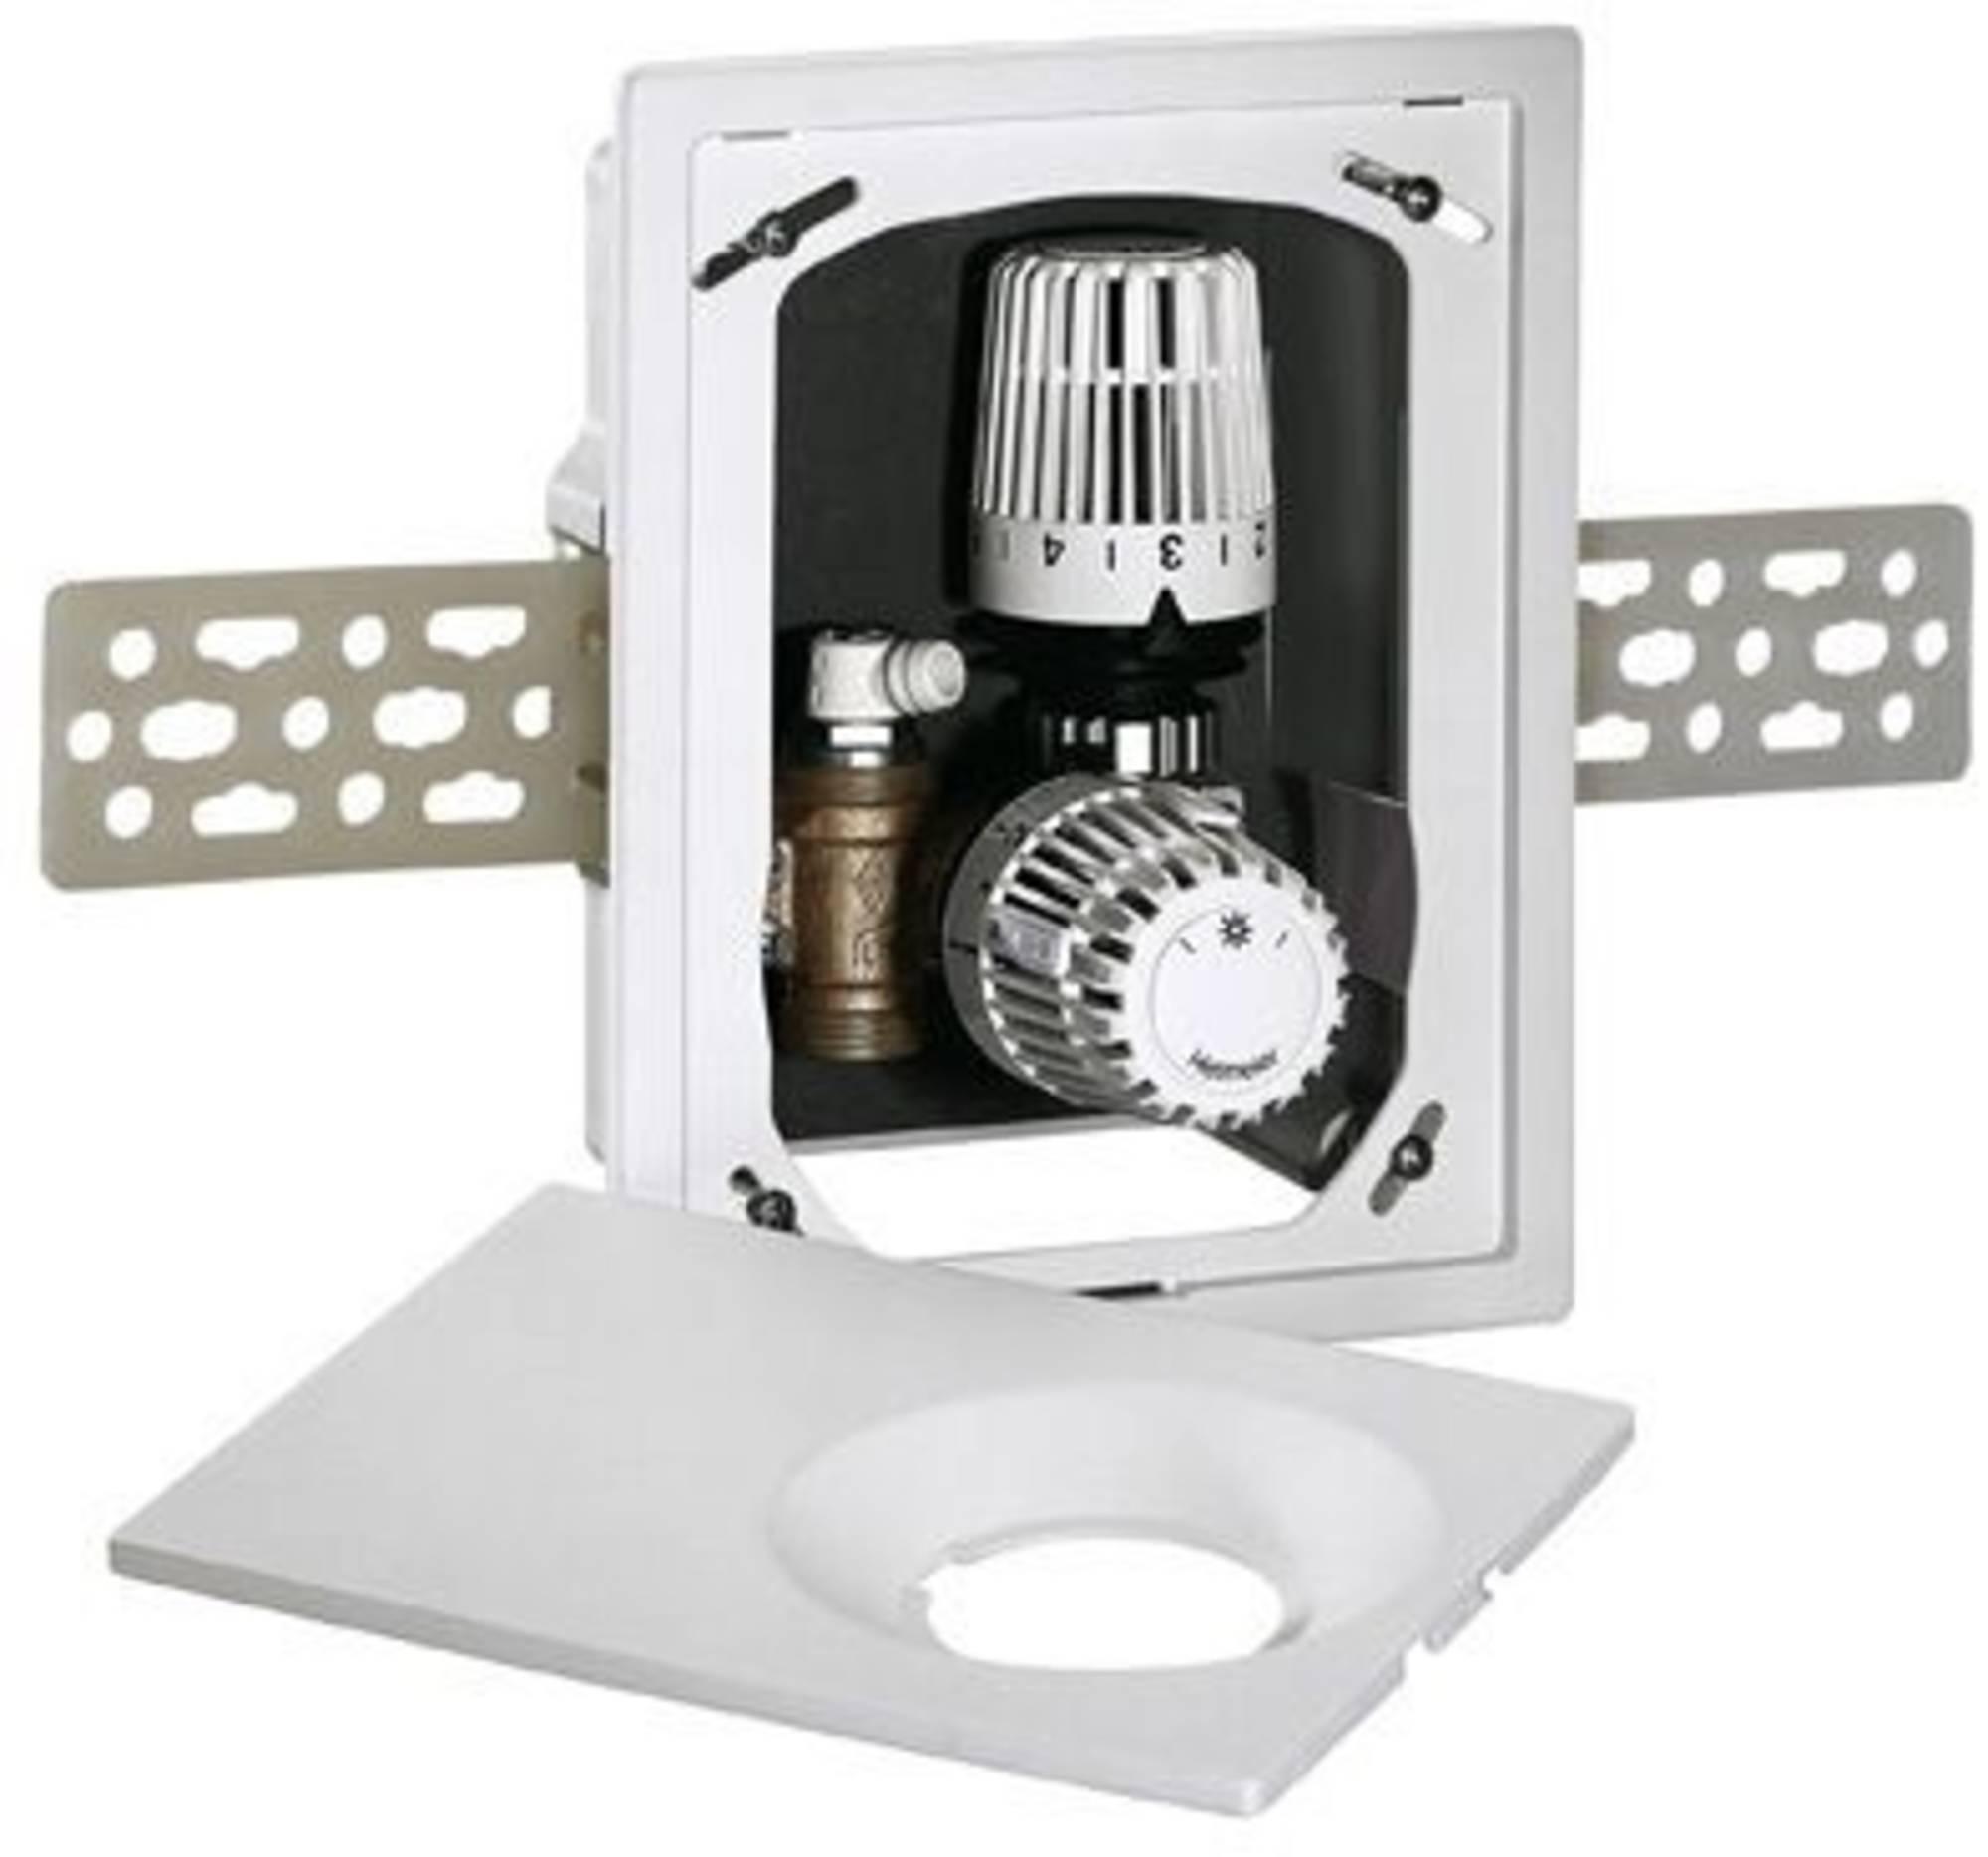 HEIMEIER multibox k-rtl ruimtetemp.regeling+waterbegrenzing (930100800)